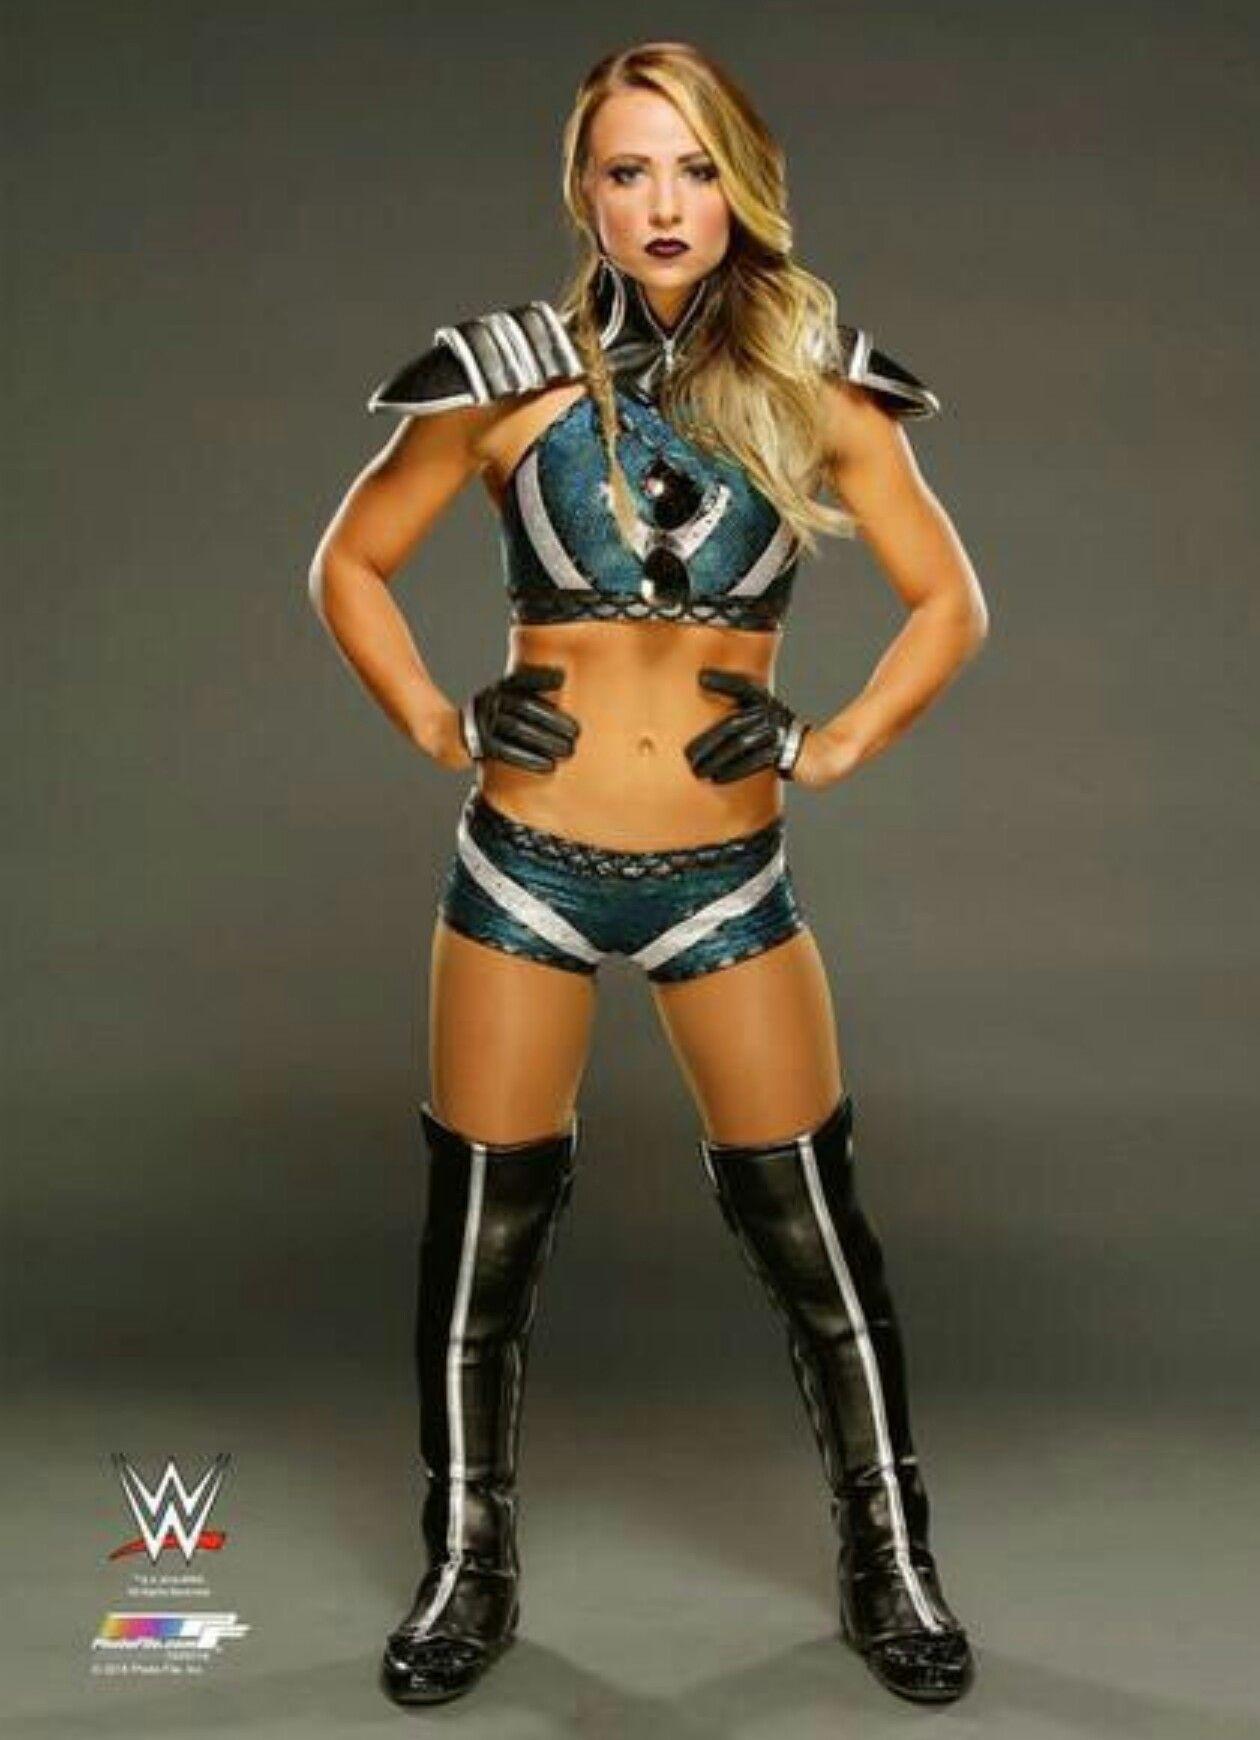 wwe raw wrestling ring